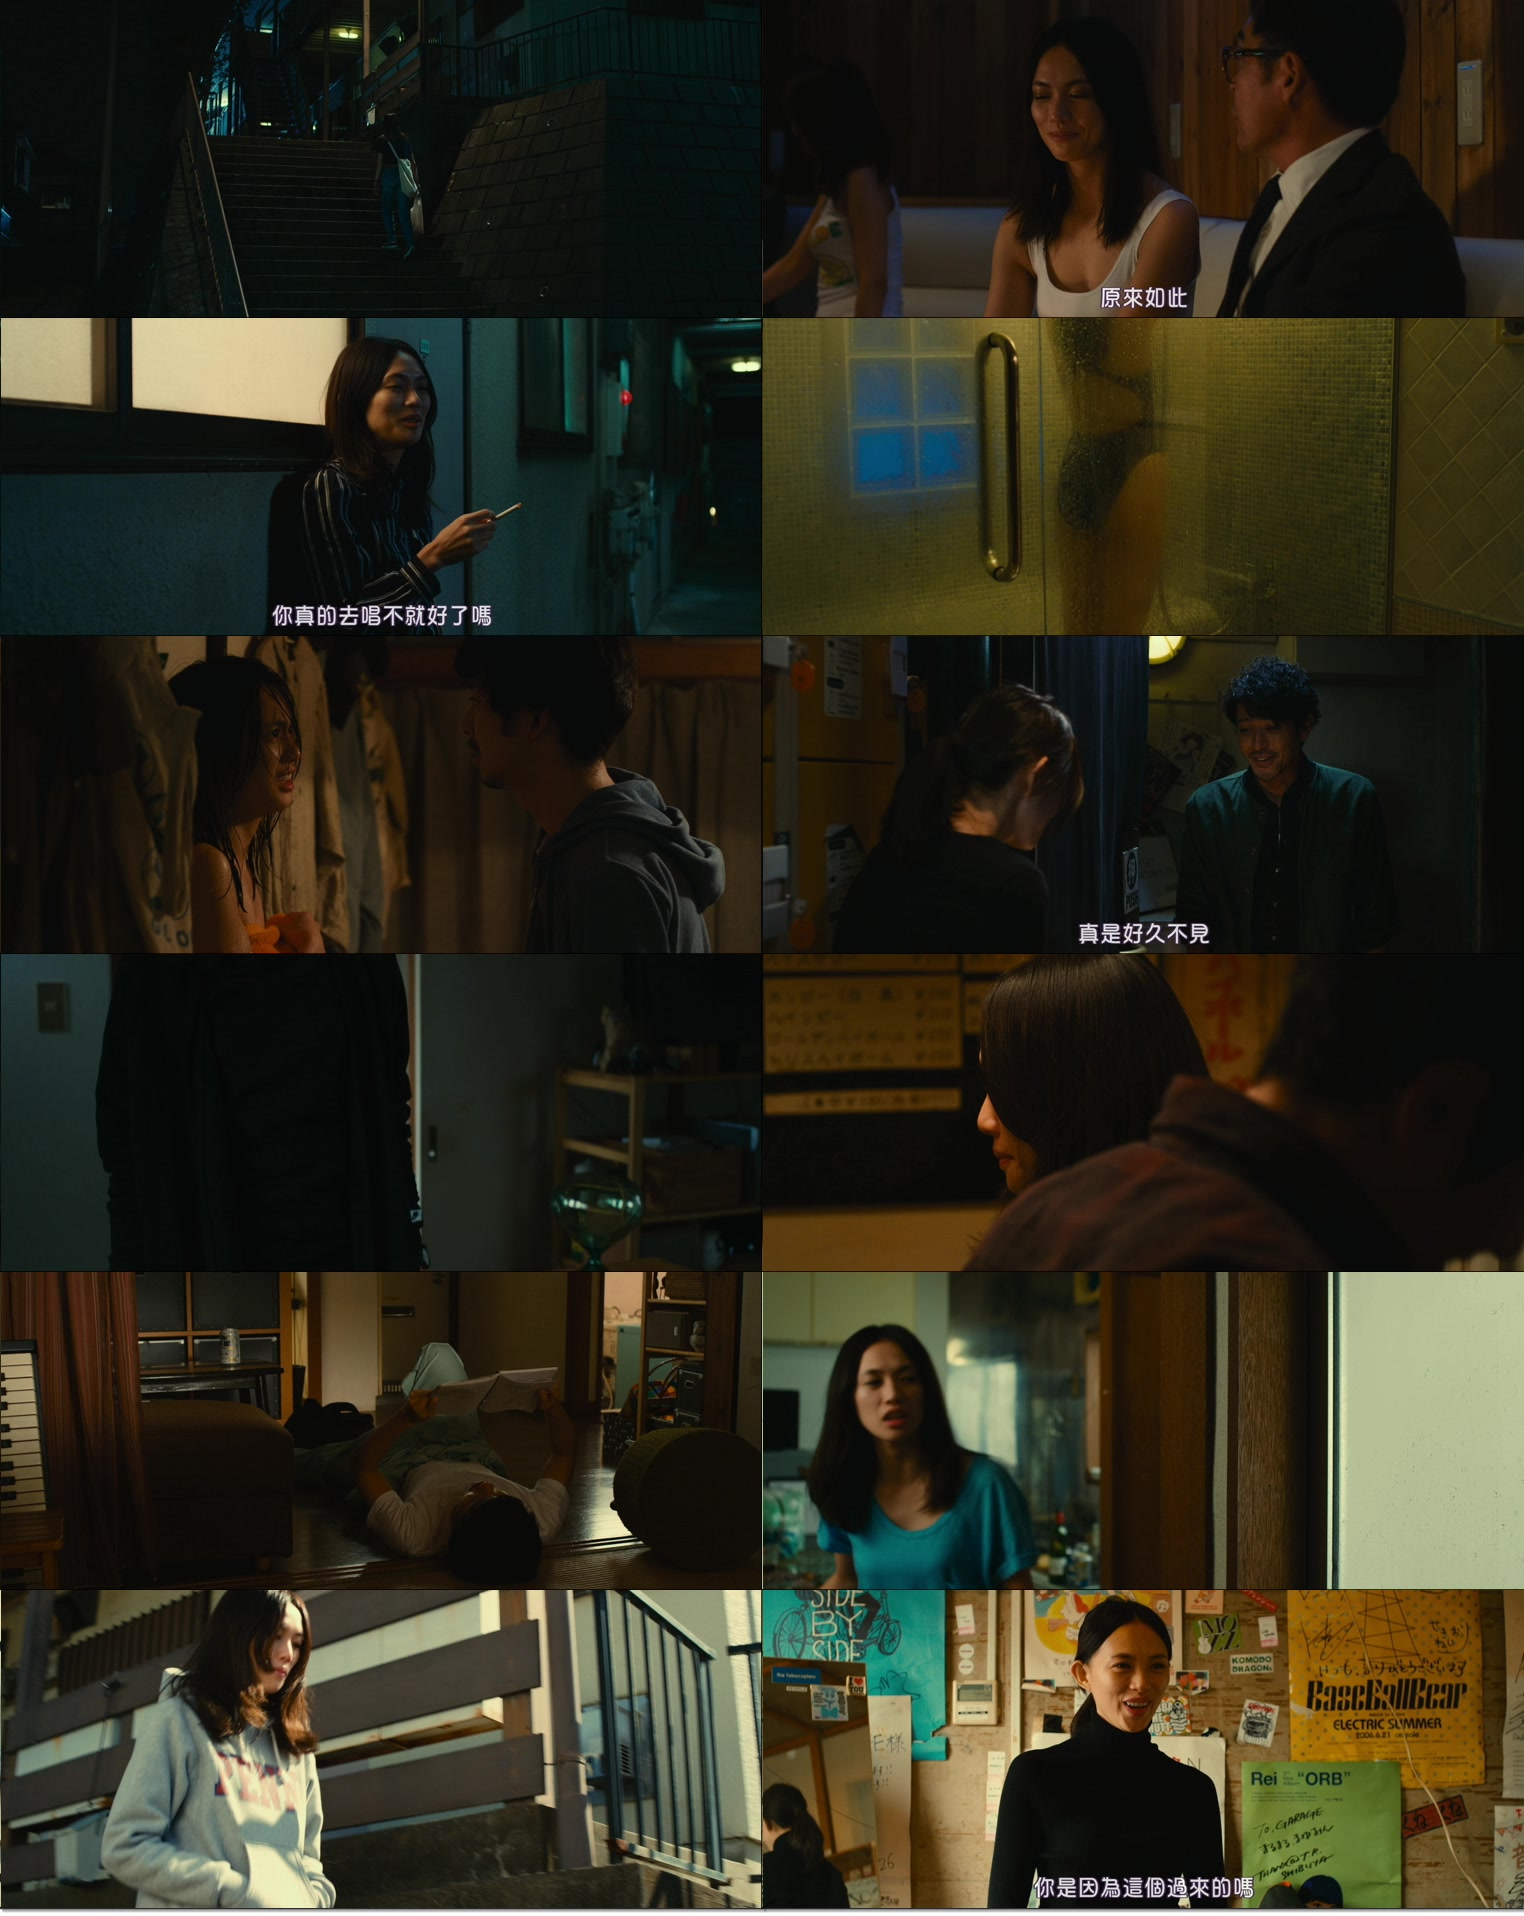 Pumpkin.and.Mayonnaise.2017.1080p.BluRay.x264.DTS-WiKi.mkv